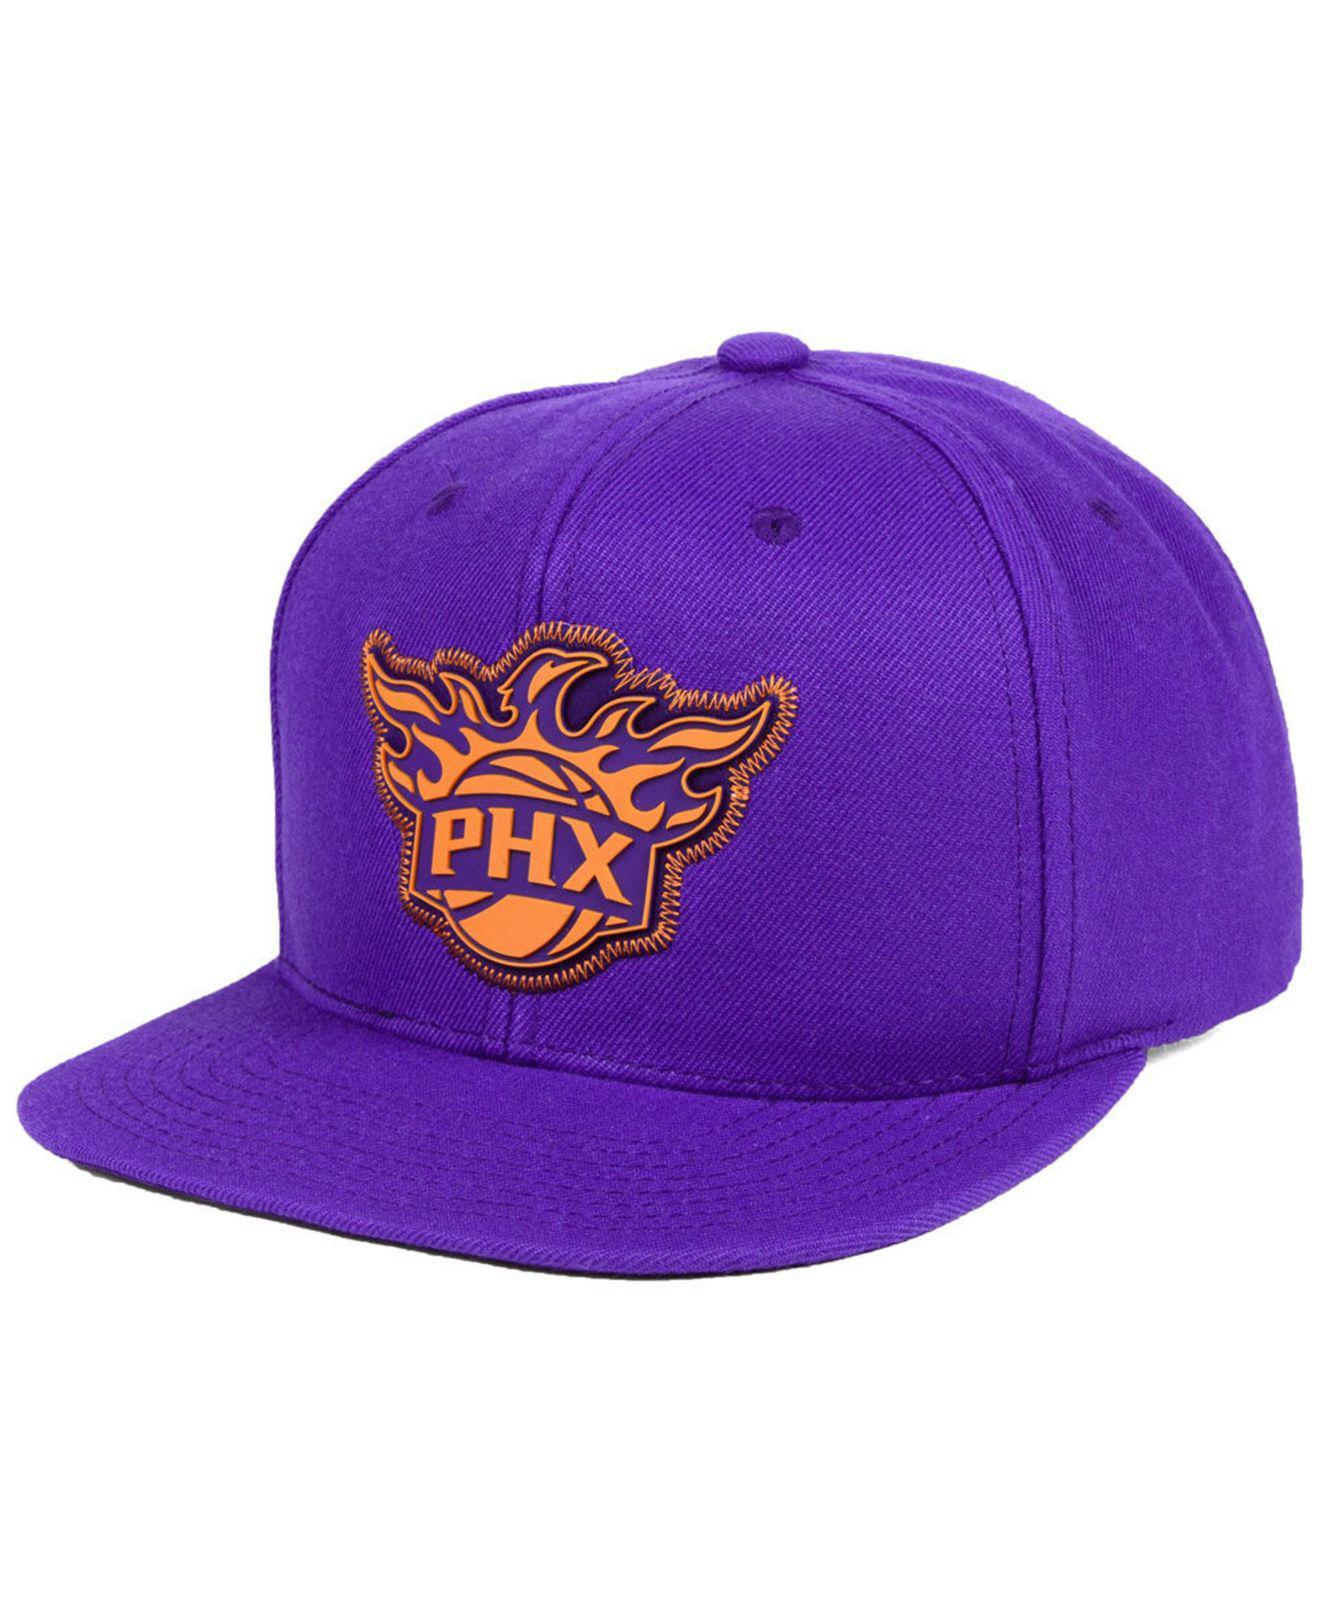 official photos 9e1d3 f7a2b ... hat cap nba 8530b 702dc  australia mitchell ness. mens purple phoenix  suns zig zag snapback cap d8f3c 708e6